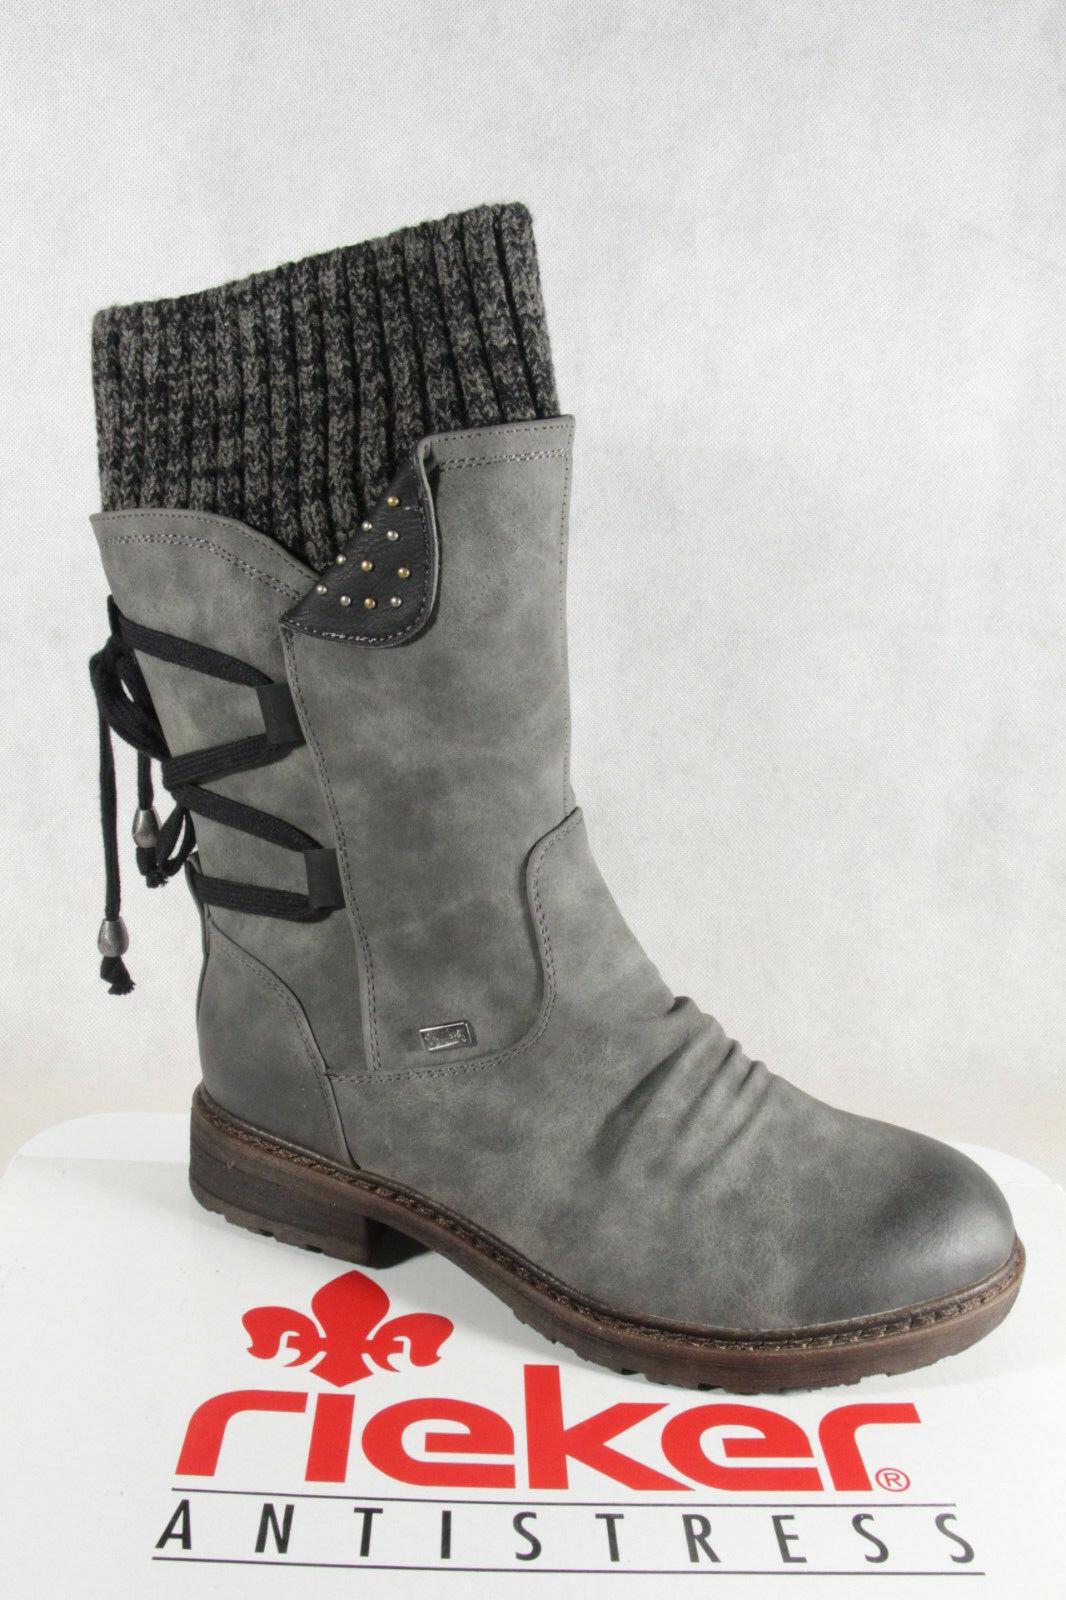 Rieker Tex Damen Stiefel Stiefeletten grau warm gefüttert 8ih6z